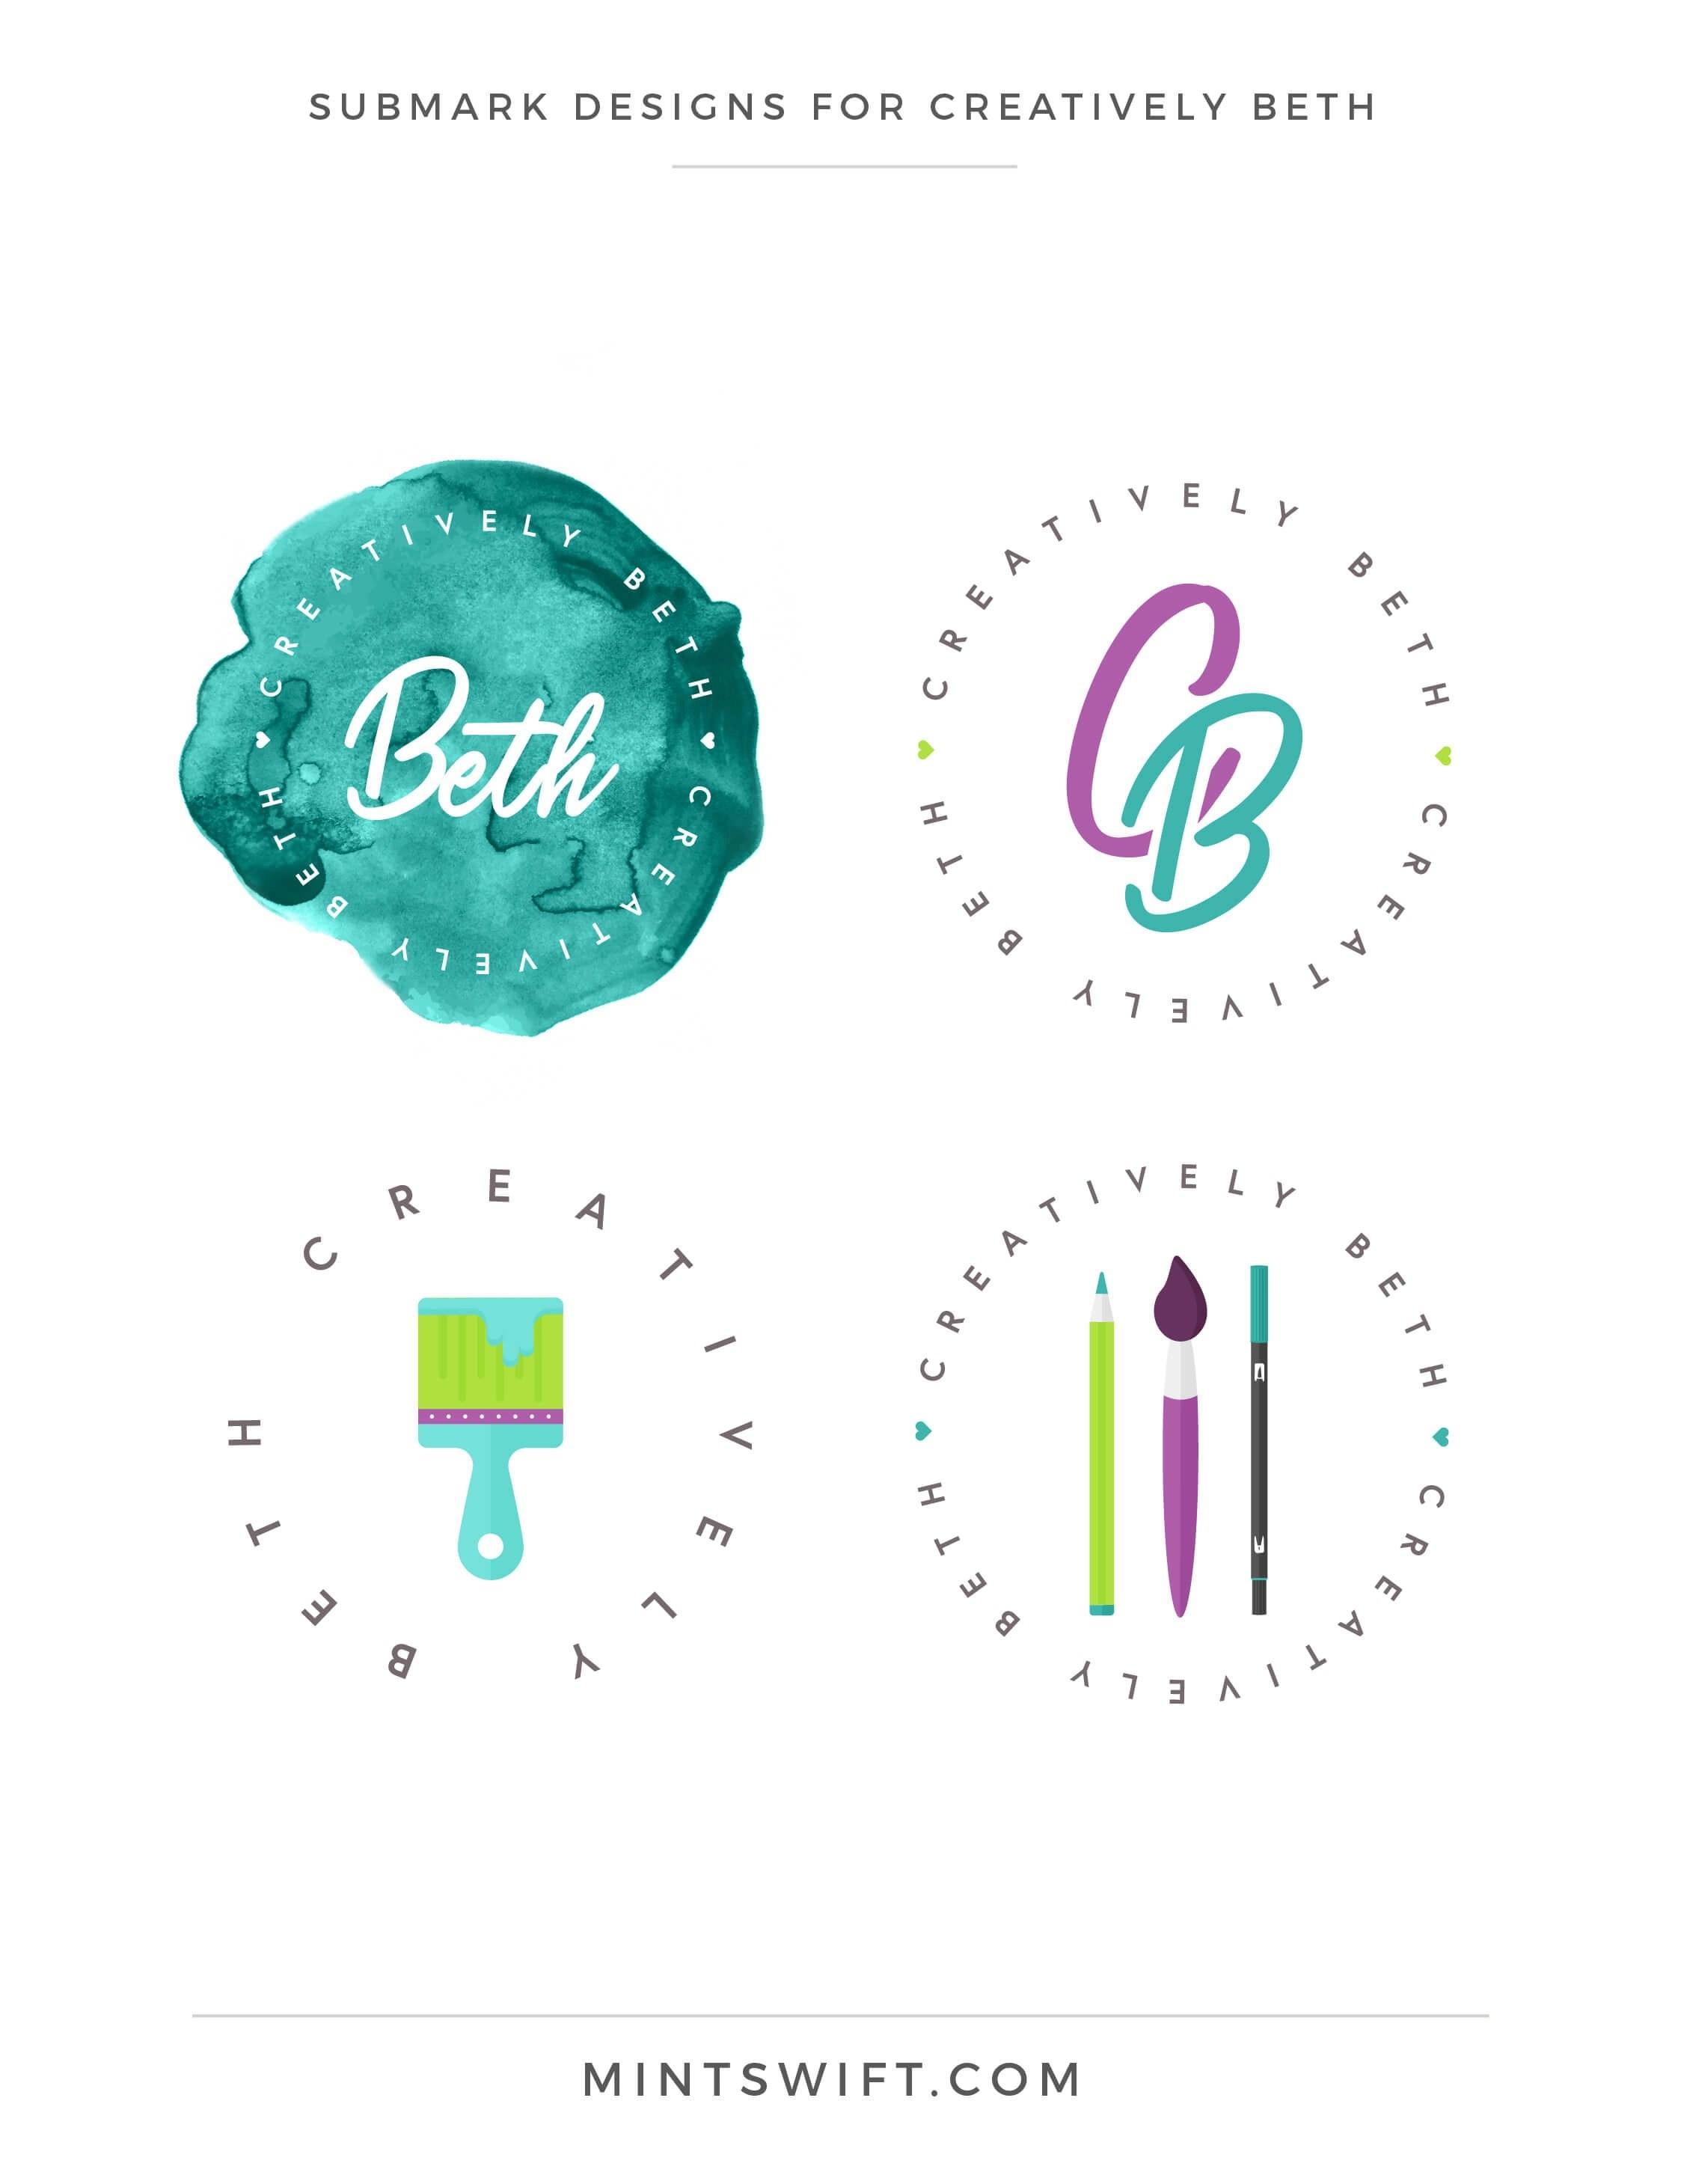 Creatively Beth - Submark Designs - Brand & Website Design - MintSwift